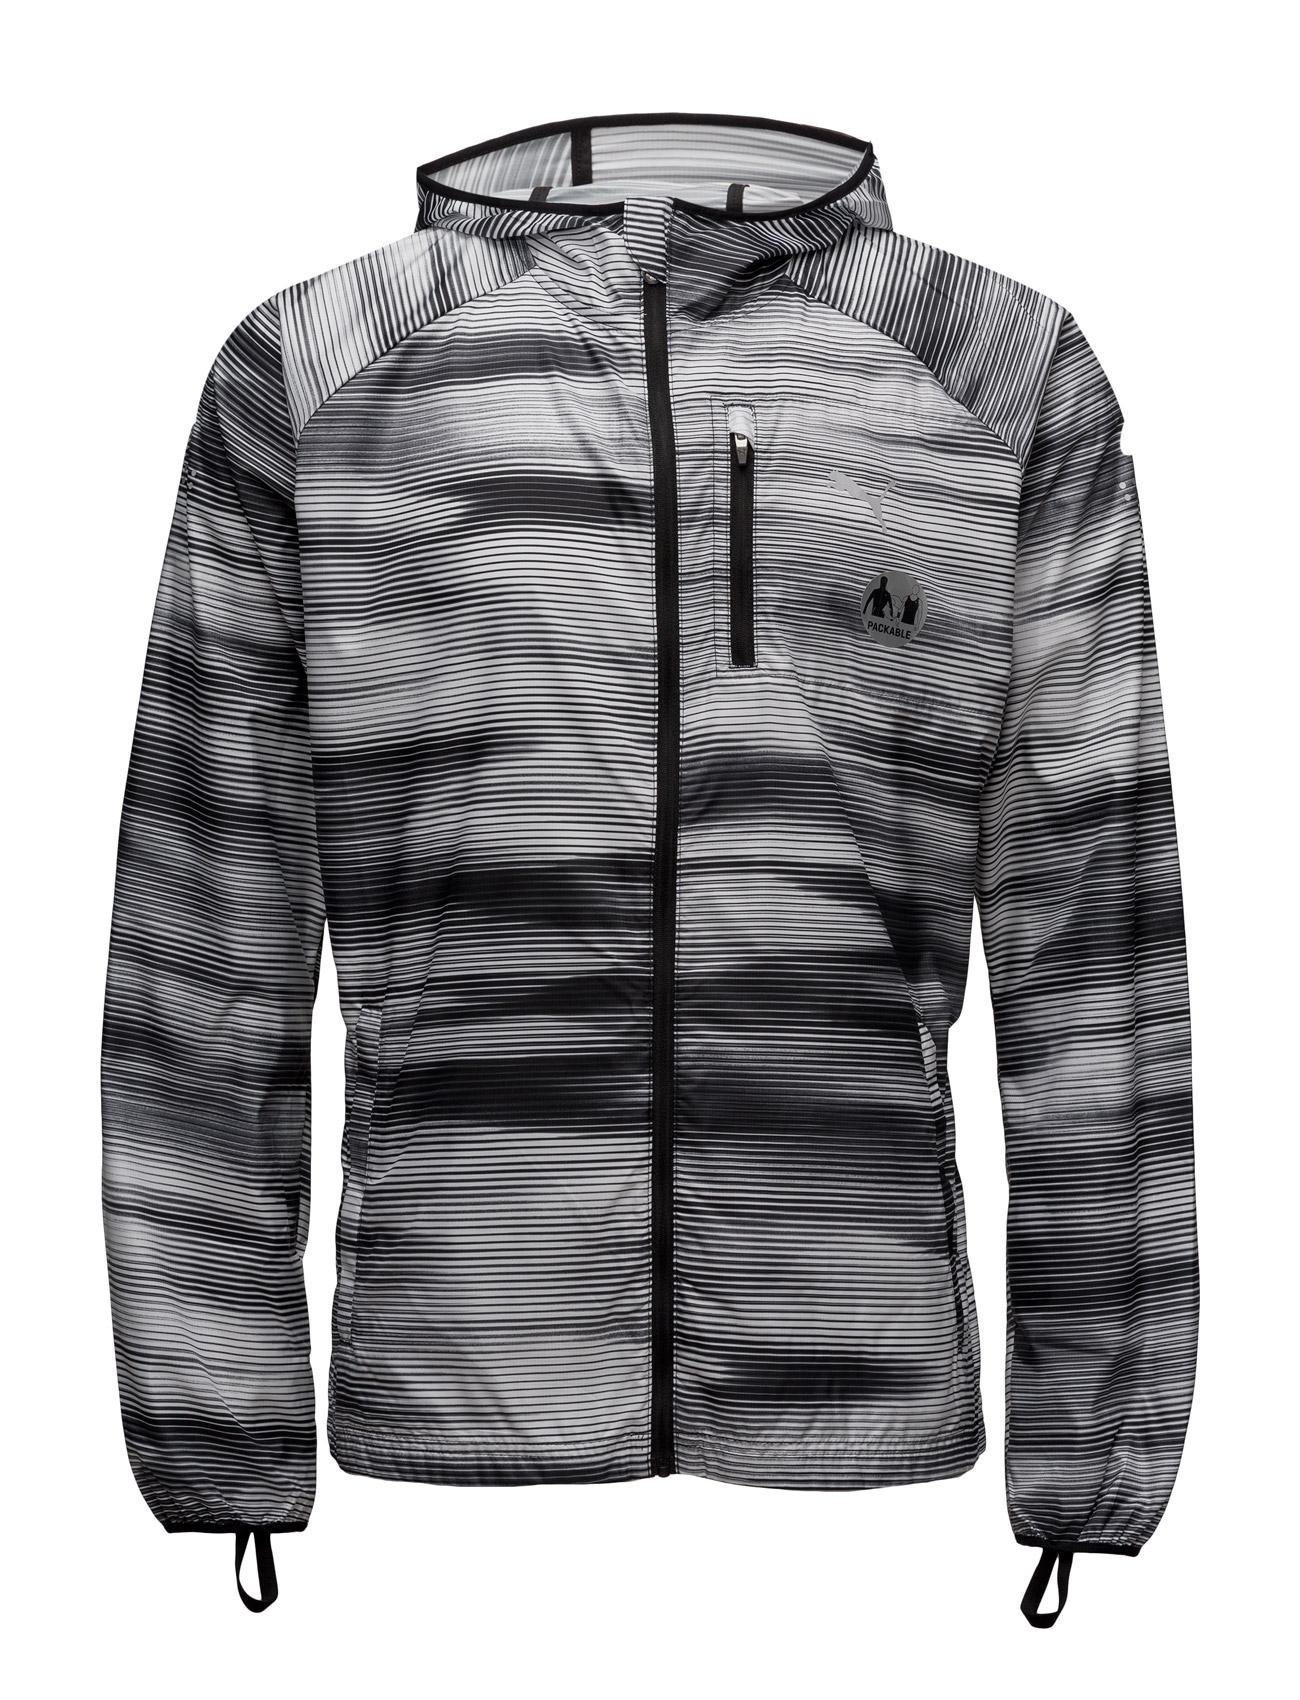 Lastlap Graphic Jacket Puma Sportsjakker til Herrer i